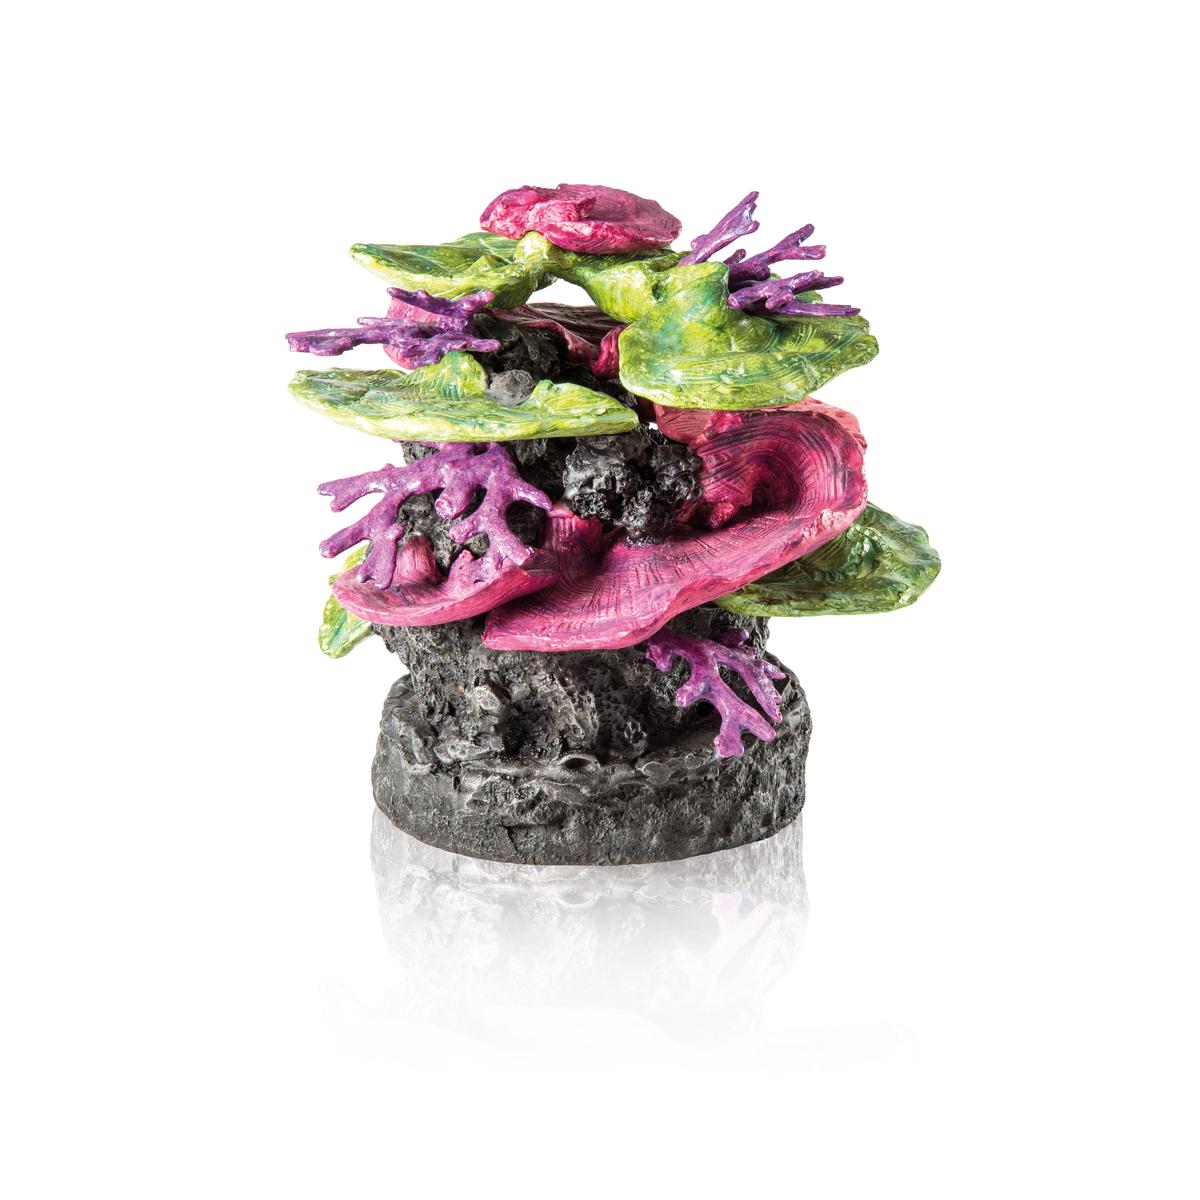 FOT_PRD_FREI_FR_48361-biOrb-Korallen-Fels-Ornament-Gruen-Lila-001_-SALL_-AINJPG_-V3